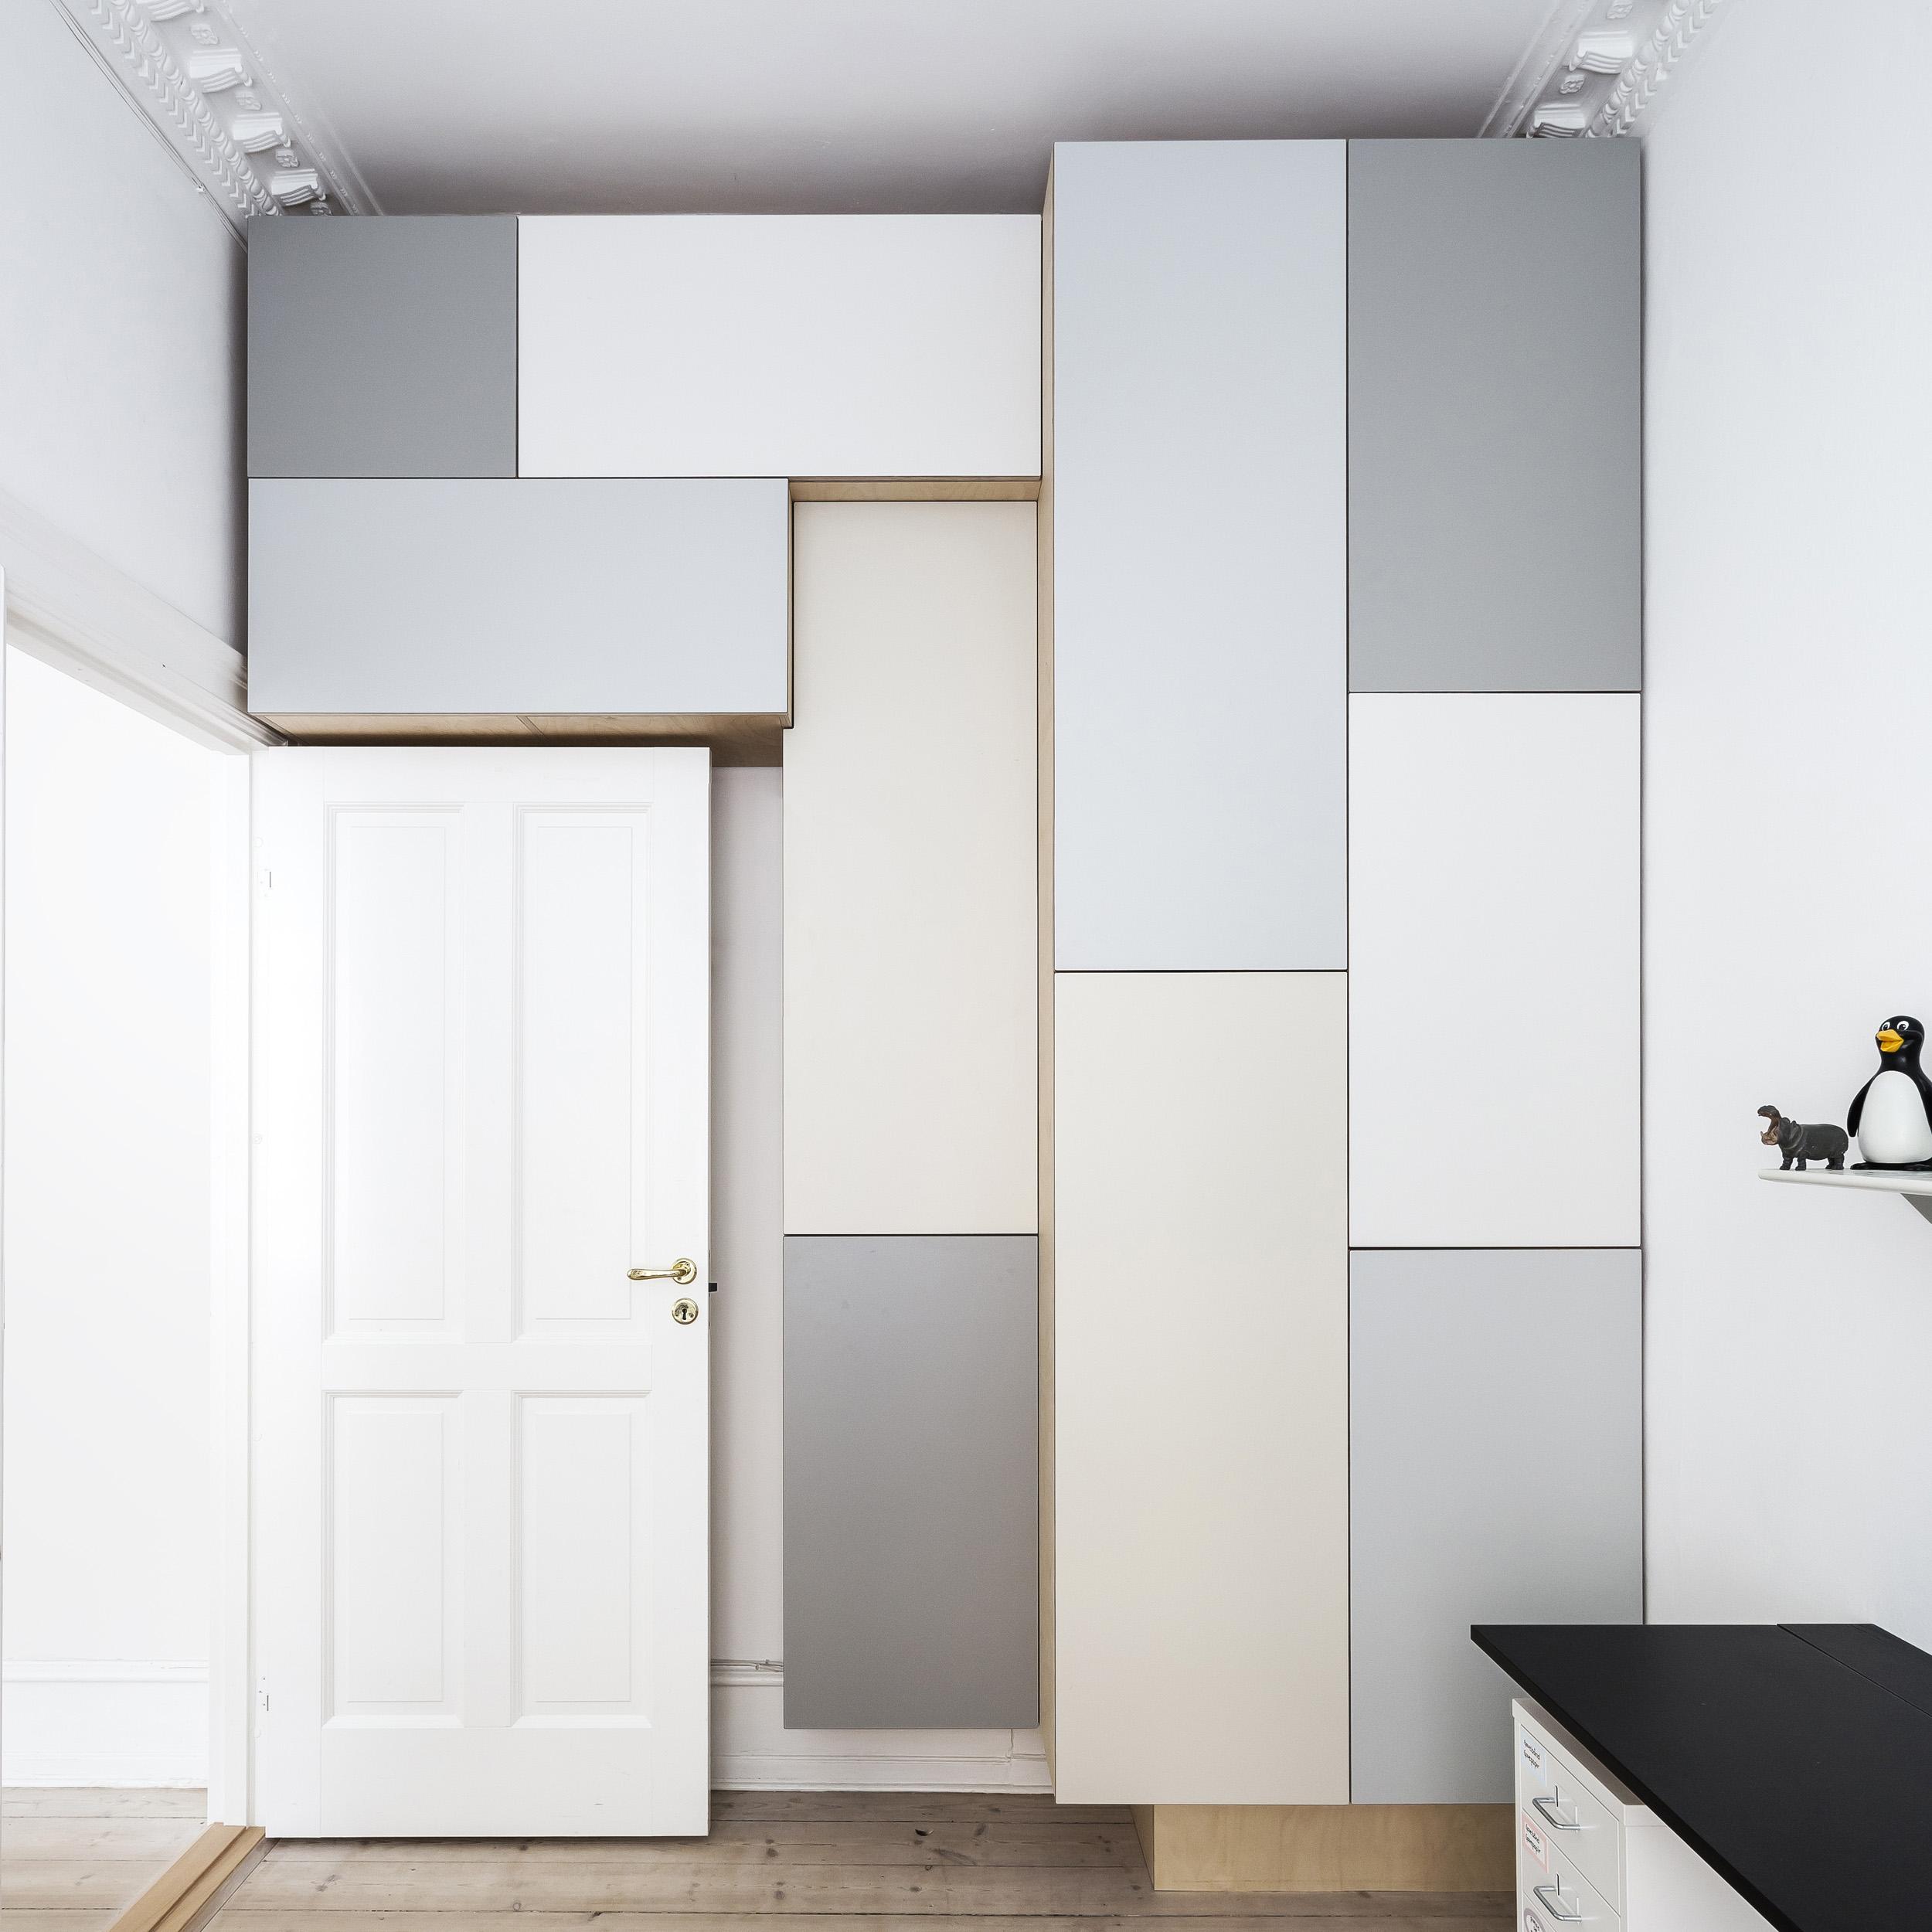 0138-m1s1-wardrobe-kids-room-built-in-grey-minimal-stay-project-2500x.jpg